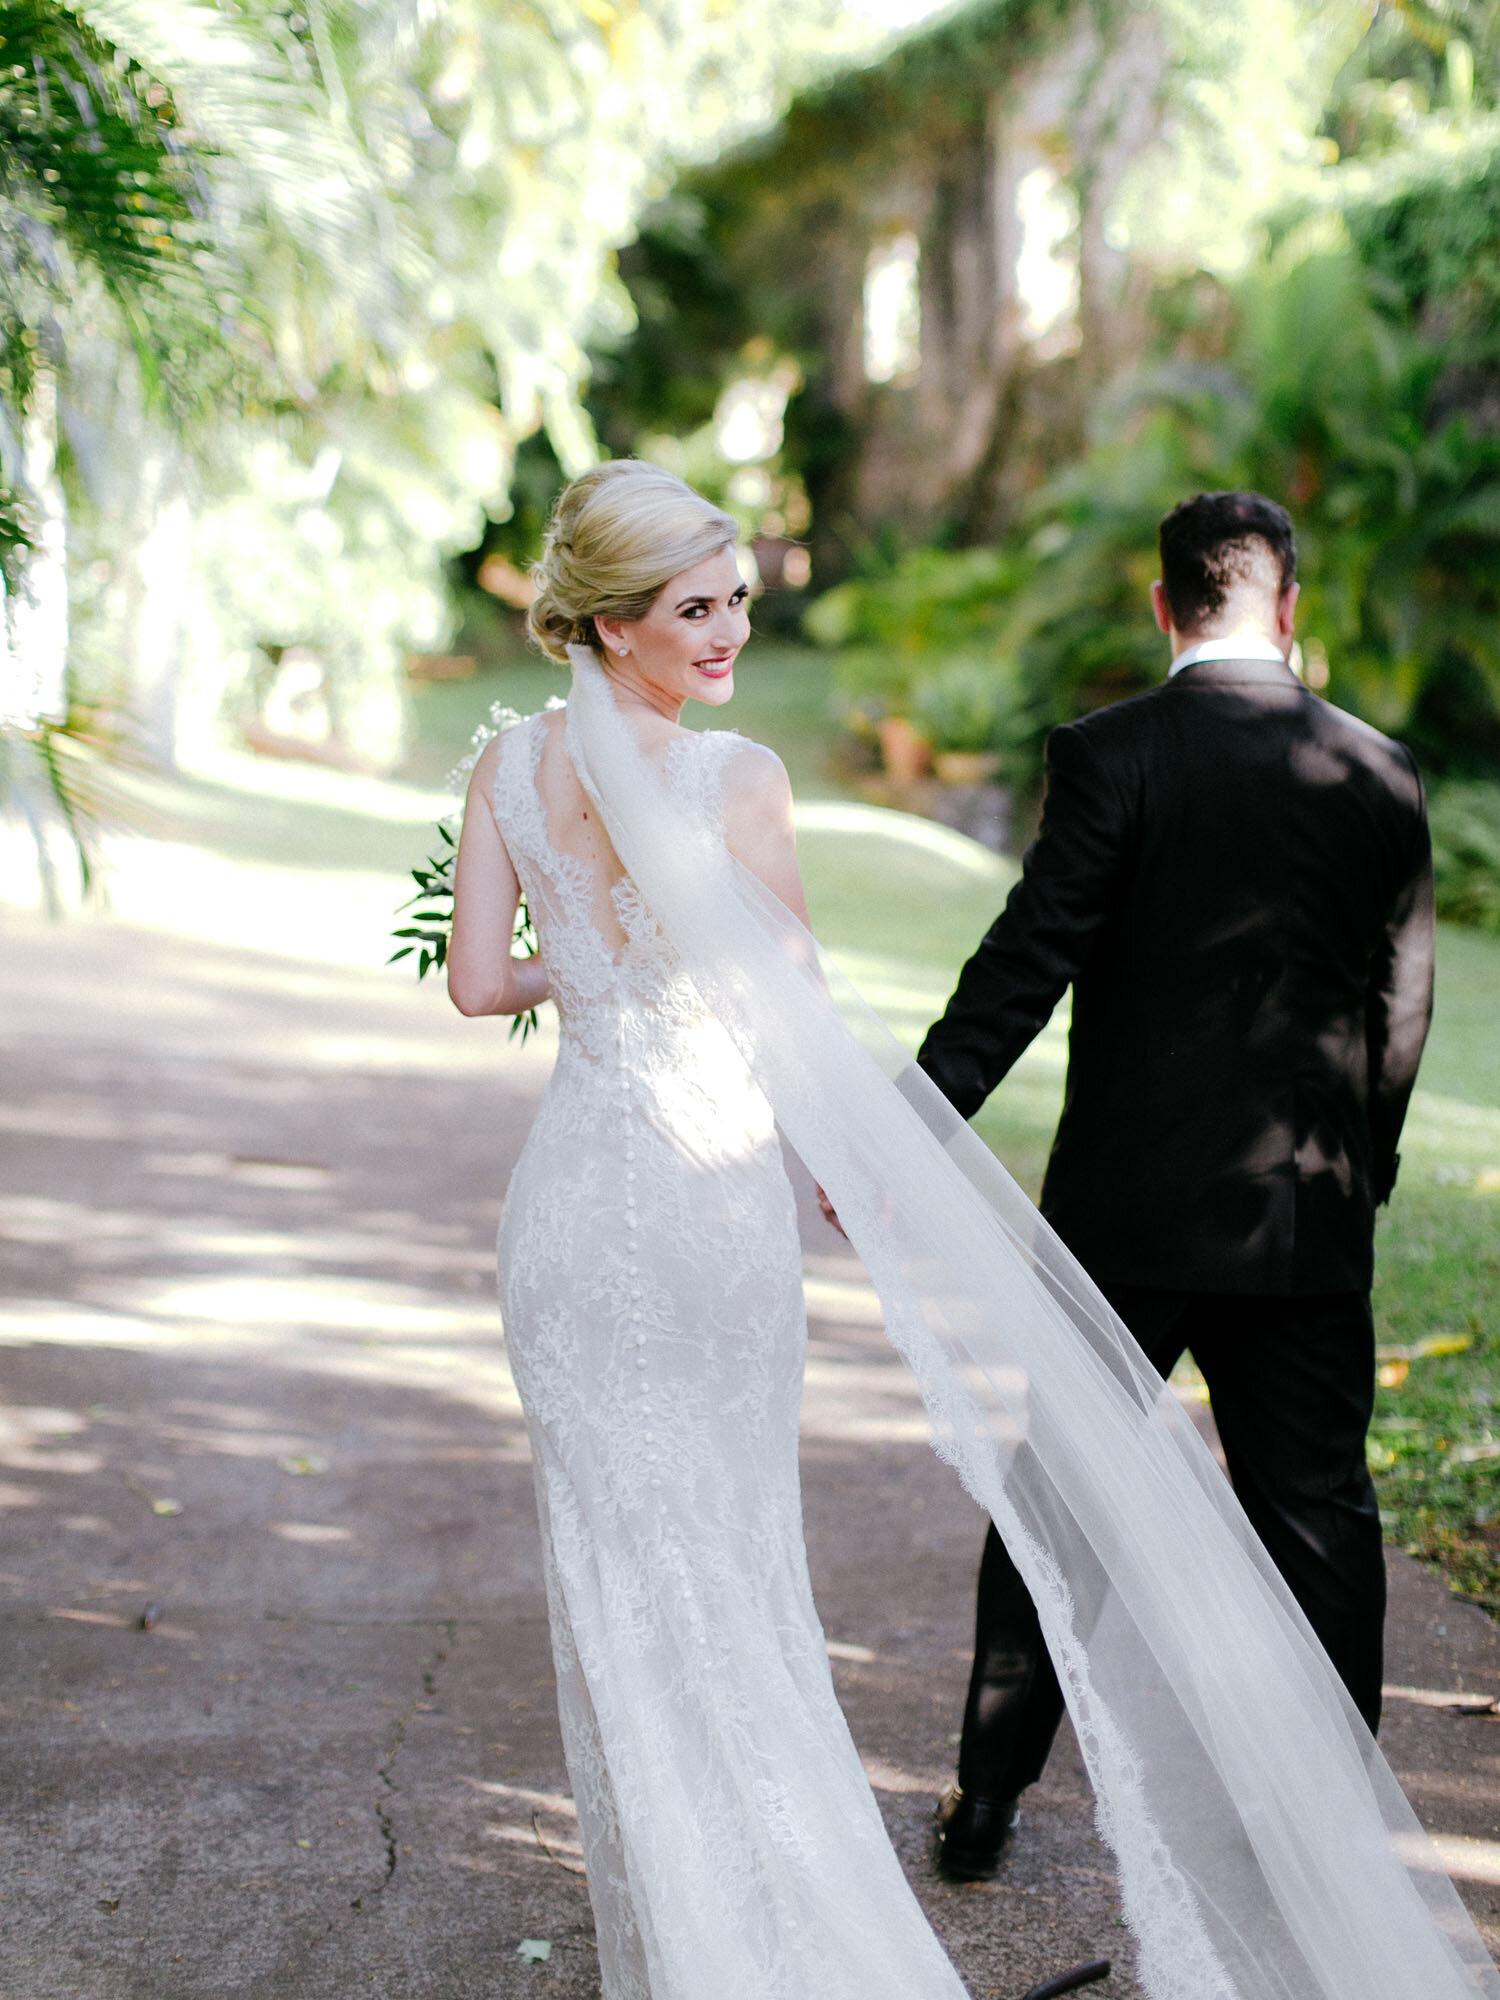 Chris-J-Evans-Maui-Wedding-Kim&Brian3259.jpg